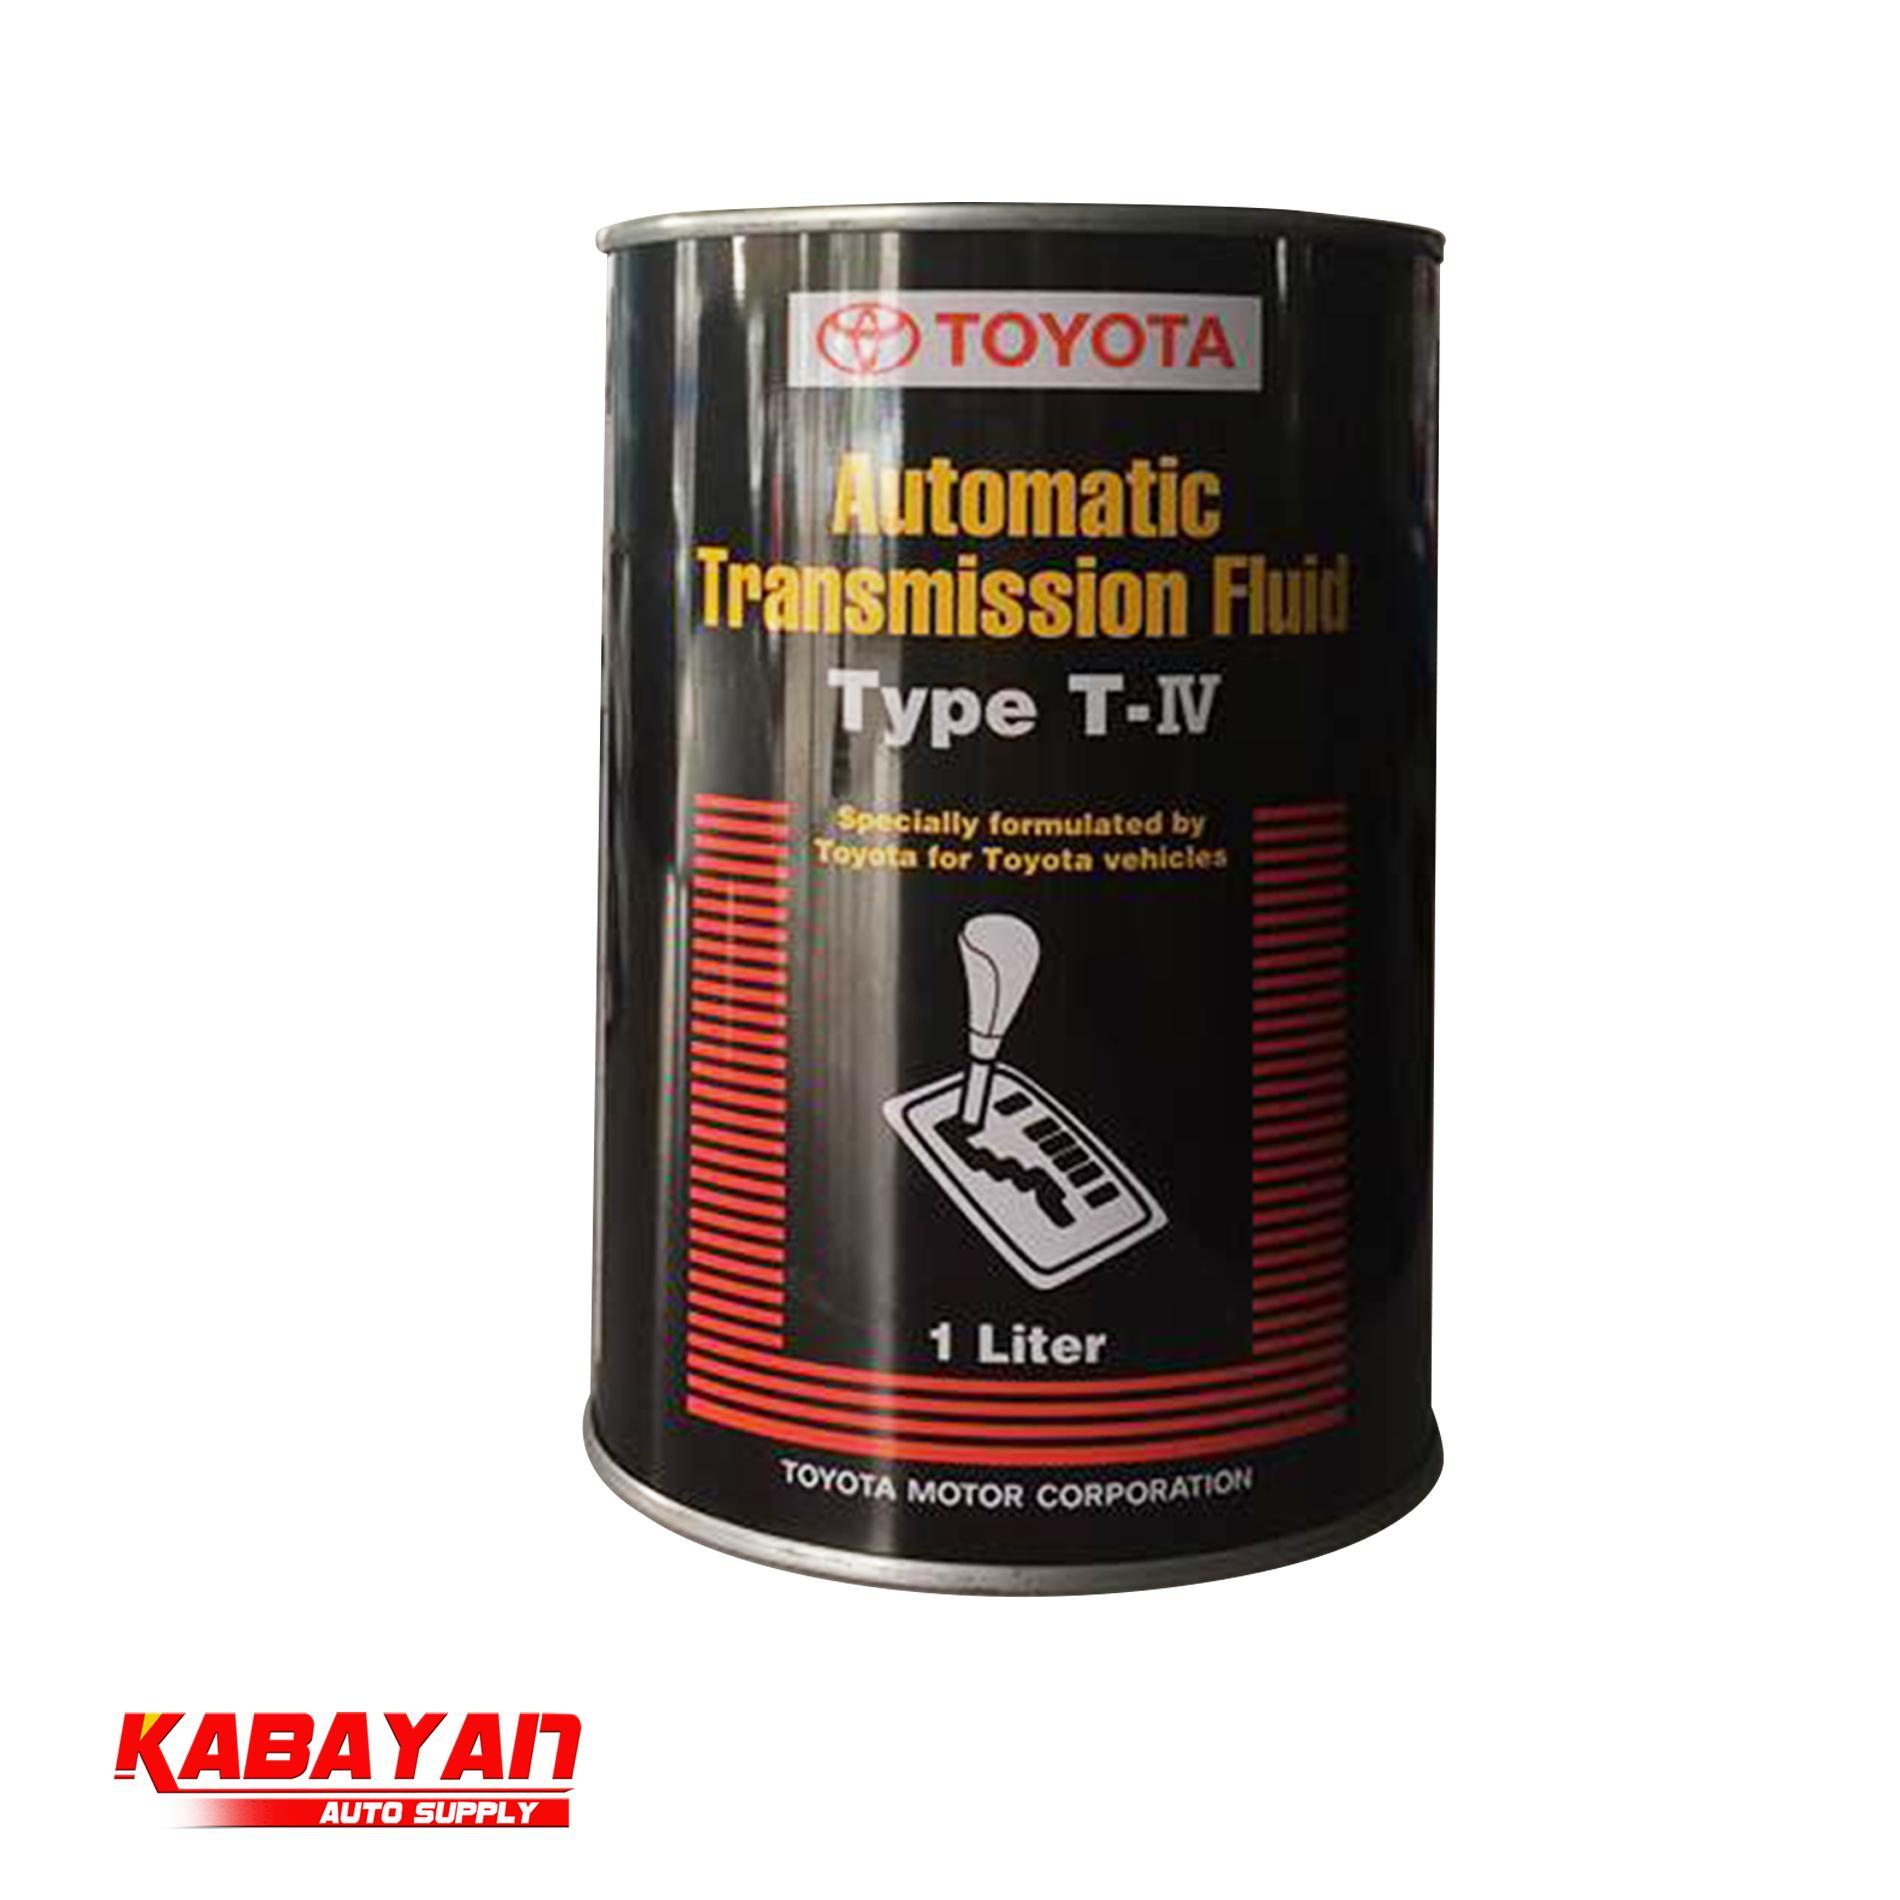 Toyota Atf Automatic Transmission Fluid